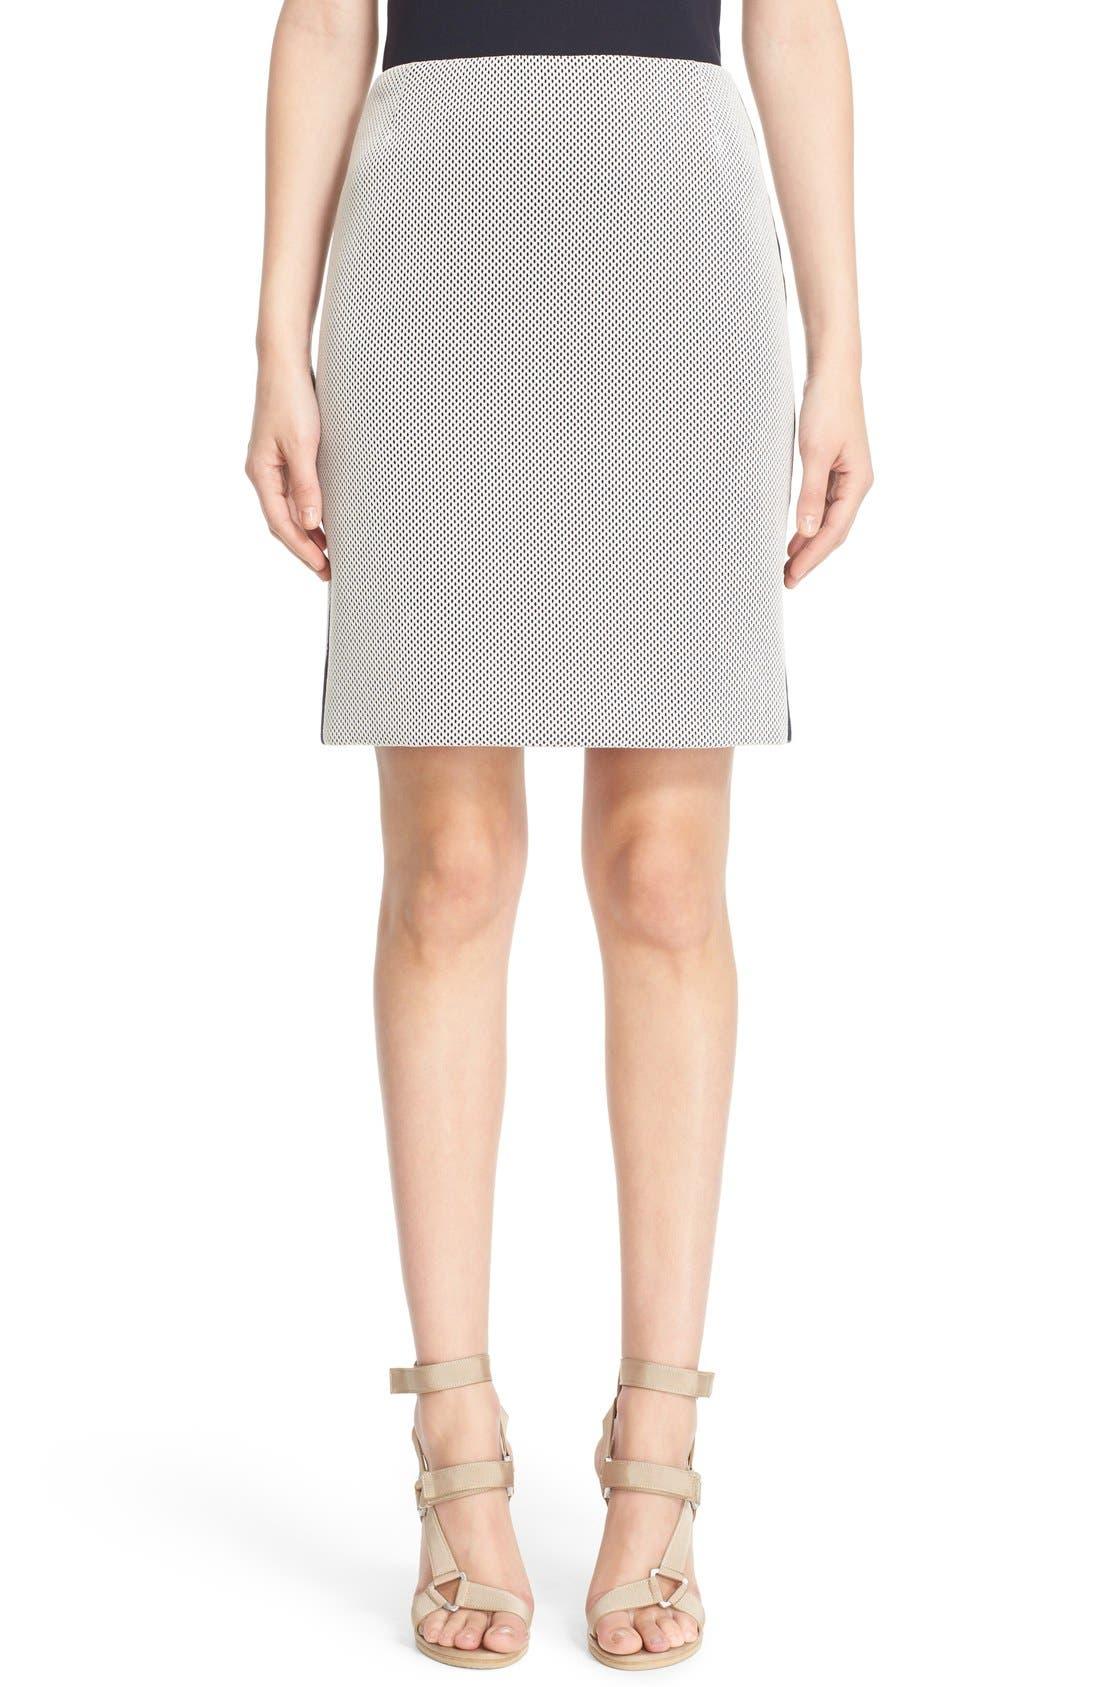 AKRIS PUNTO Side Stripe Mesh Pencil Skirt, Main, color, 900